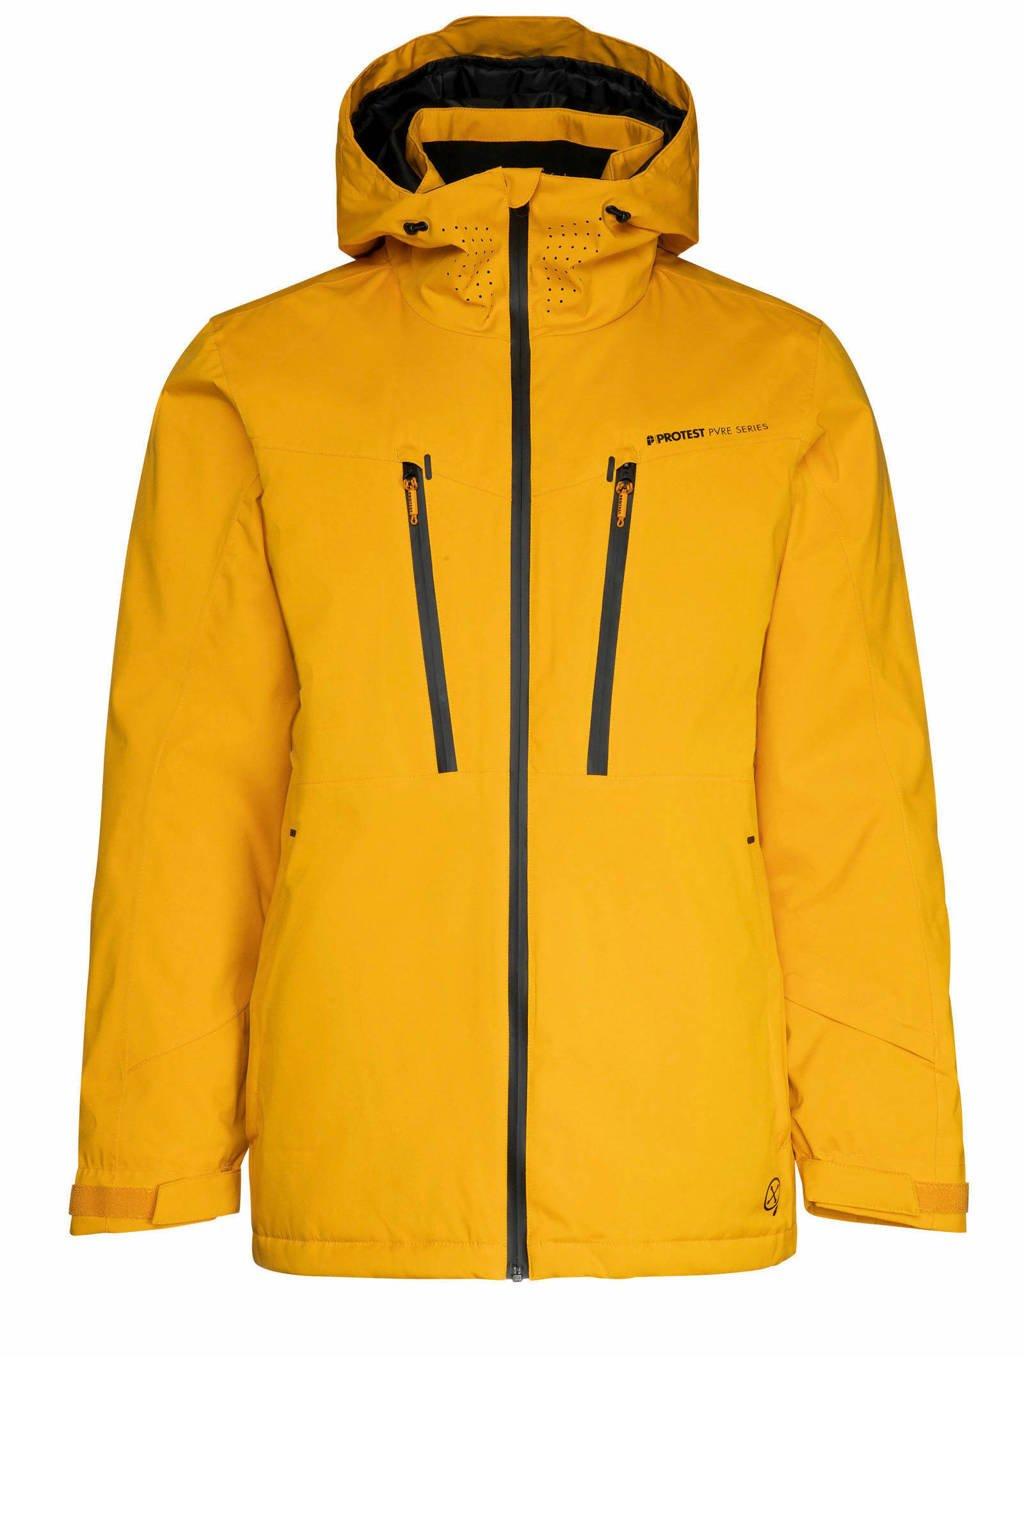 Protest Timo ski-jack geel, Dark yellow